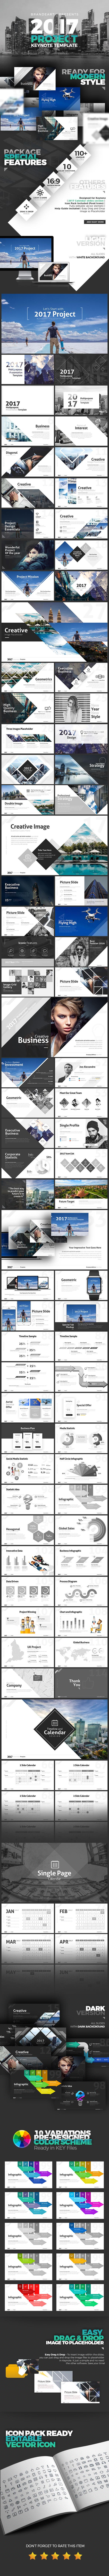 2017 Project Keynote Presentation - Keynote Templates Presentation Templates